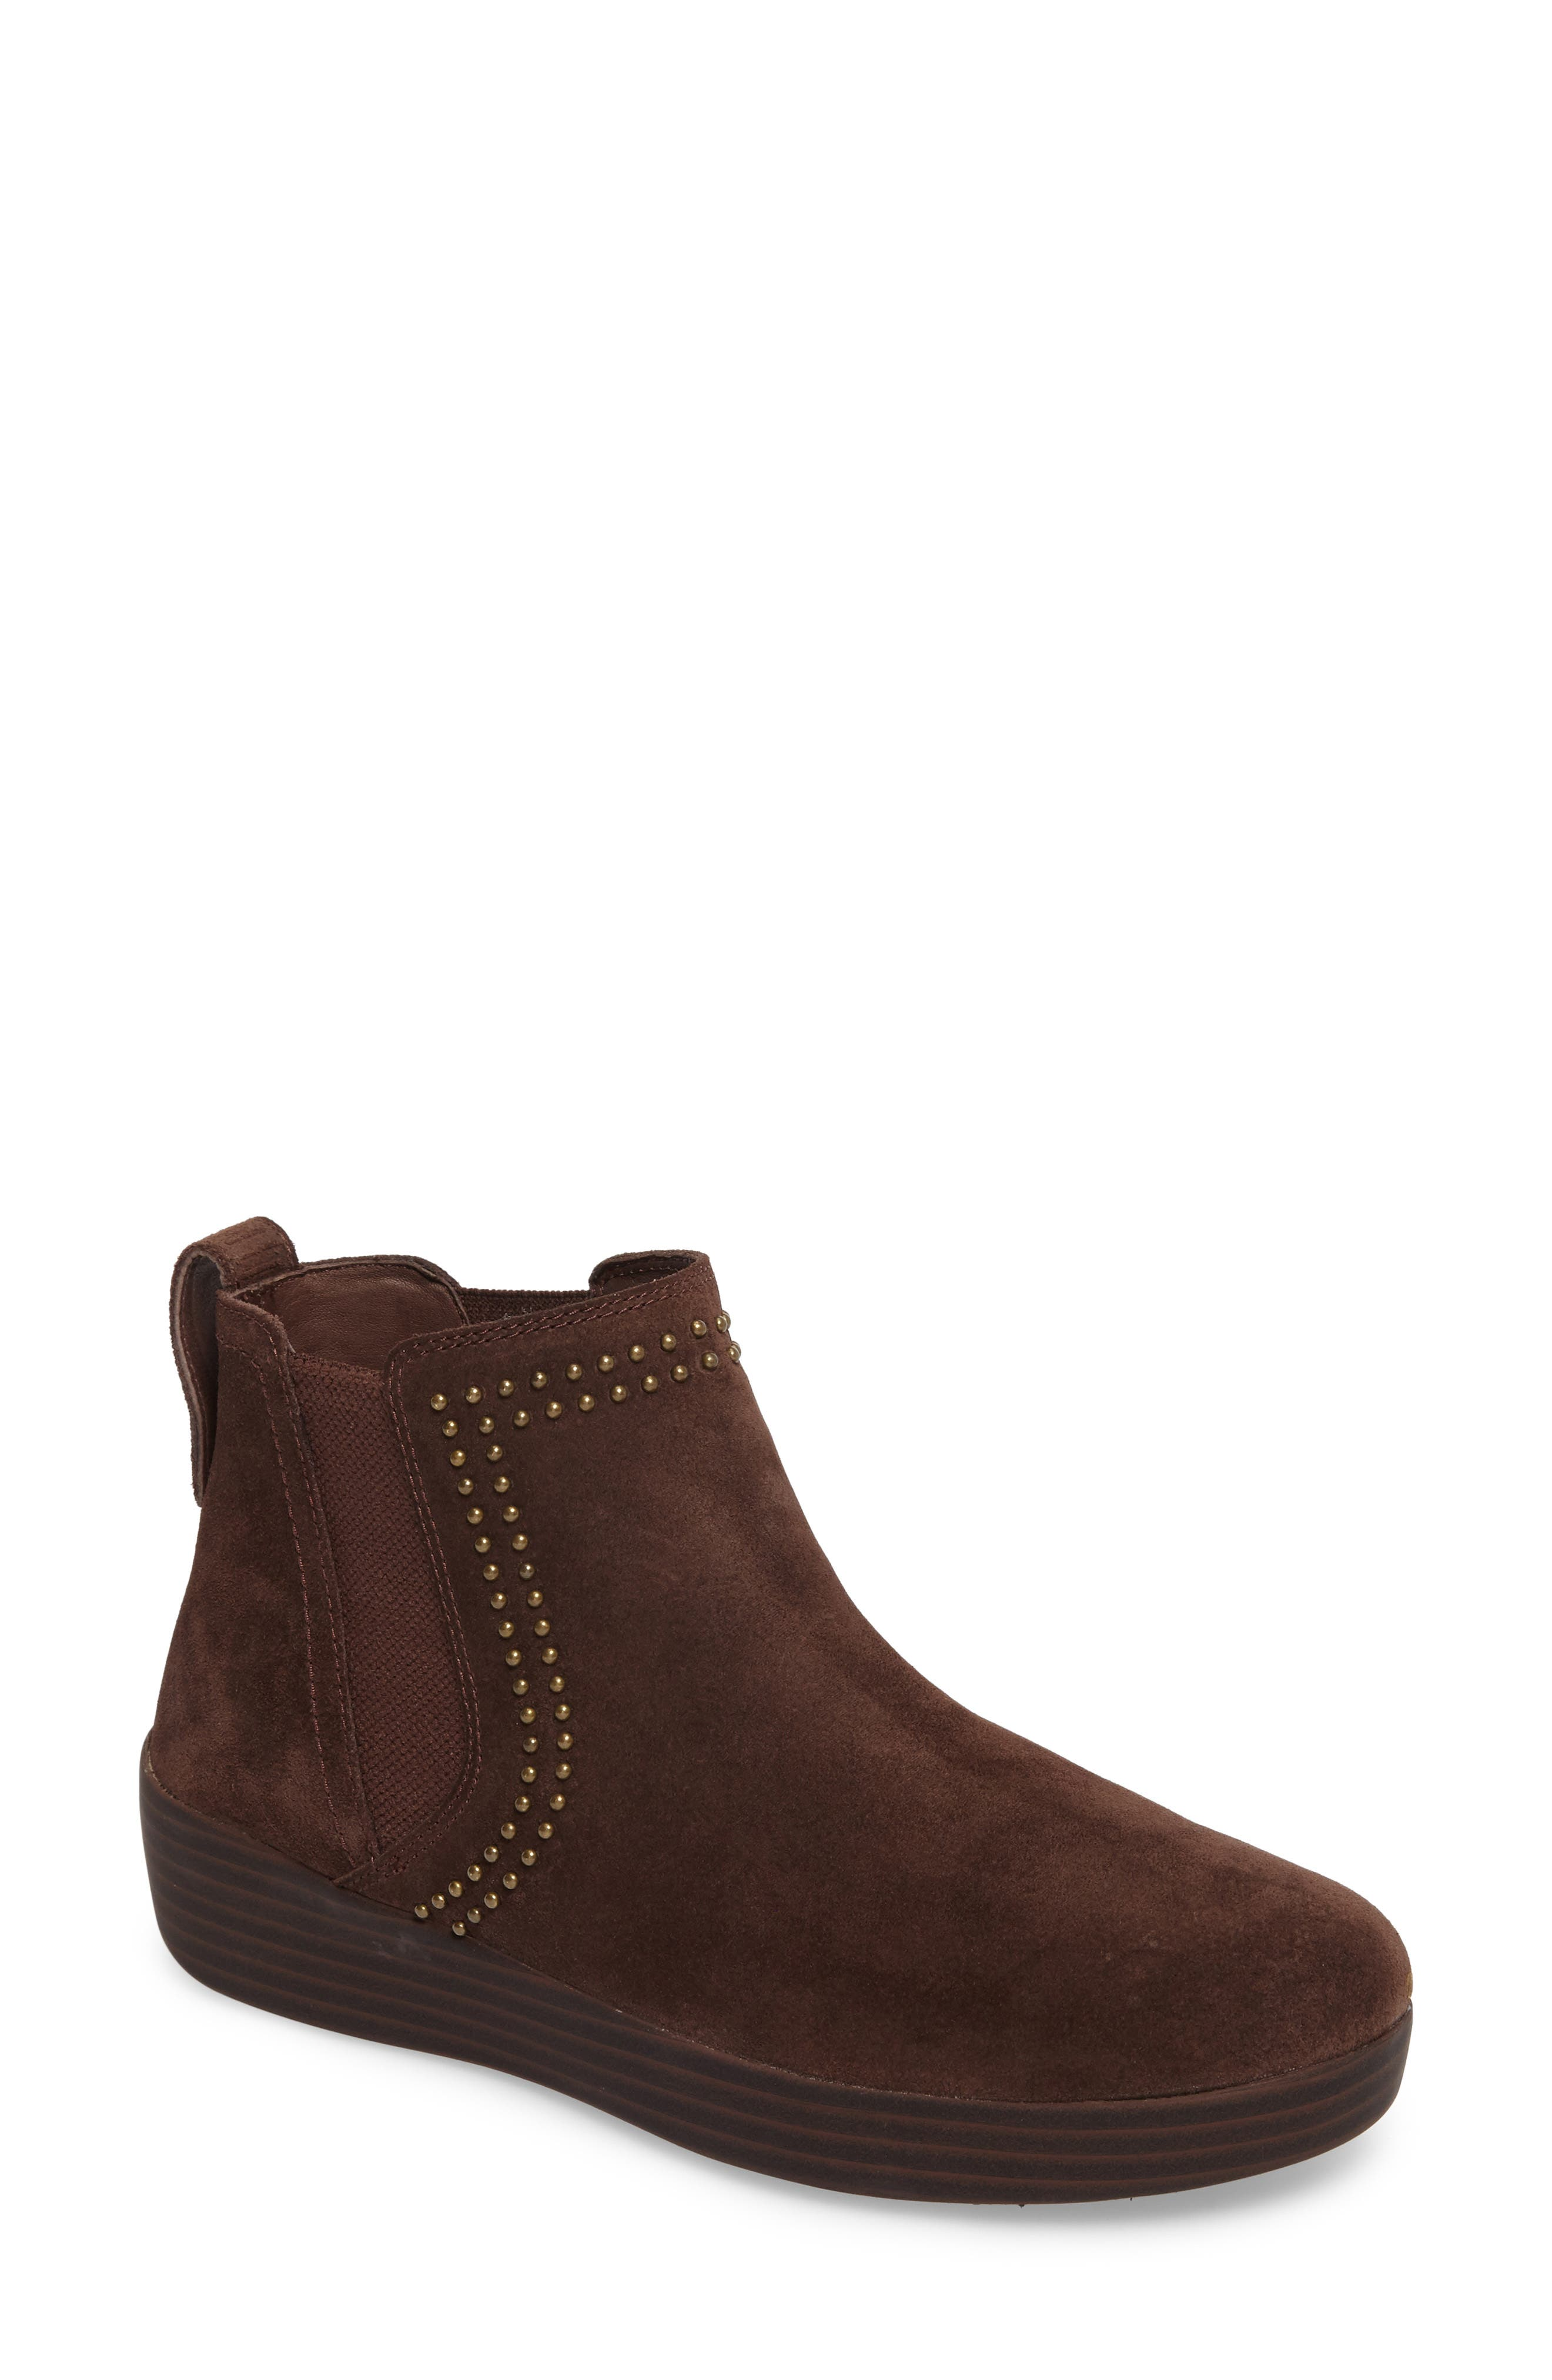 Superchelsea Studded Boot,                         Main,                         color, 201